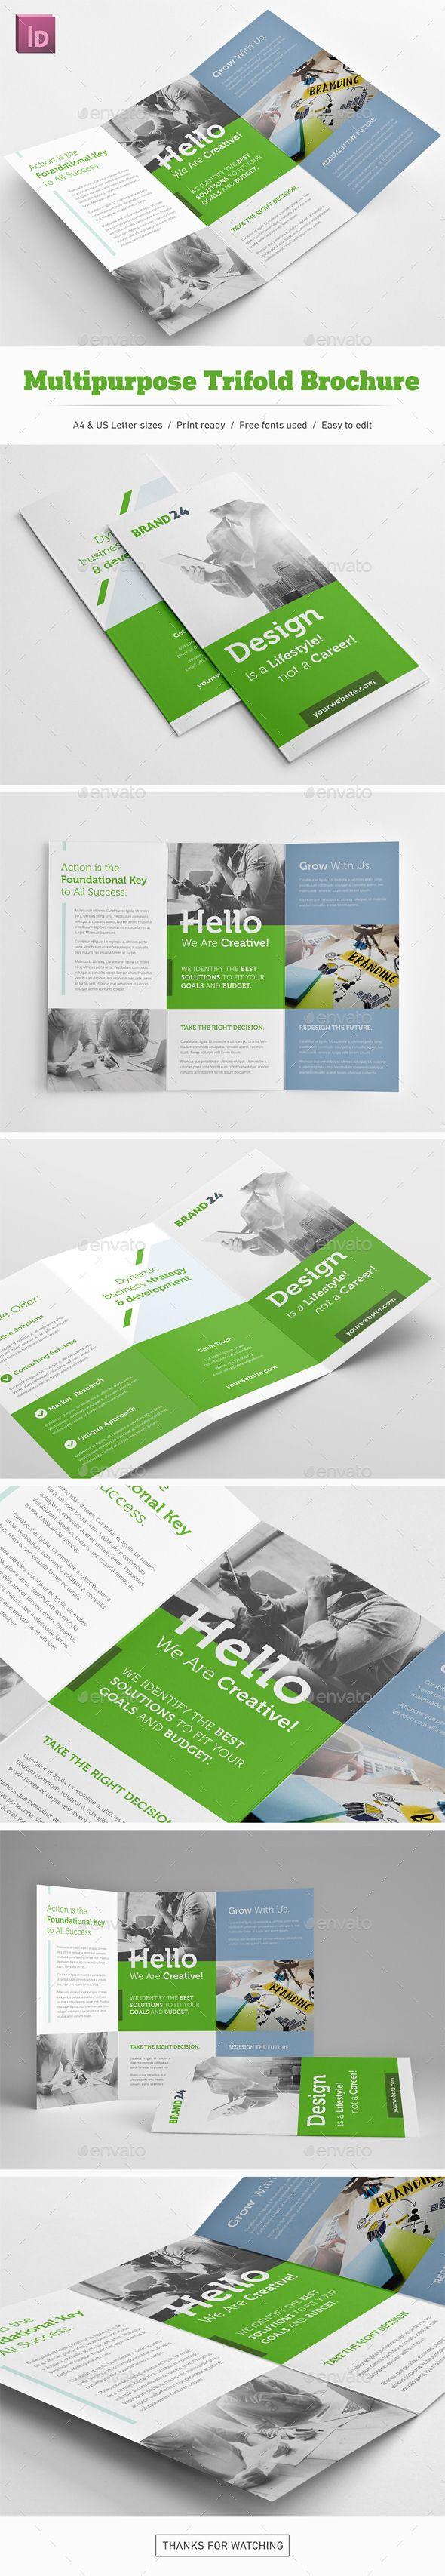 Multipurposel Trifold Brochure Template InDesign INDD  gostei desse retangulo verde embaixo de tudo passando por todas paginas